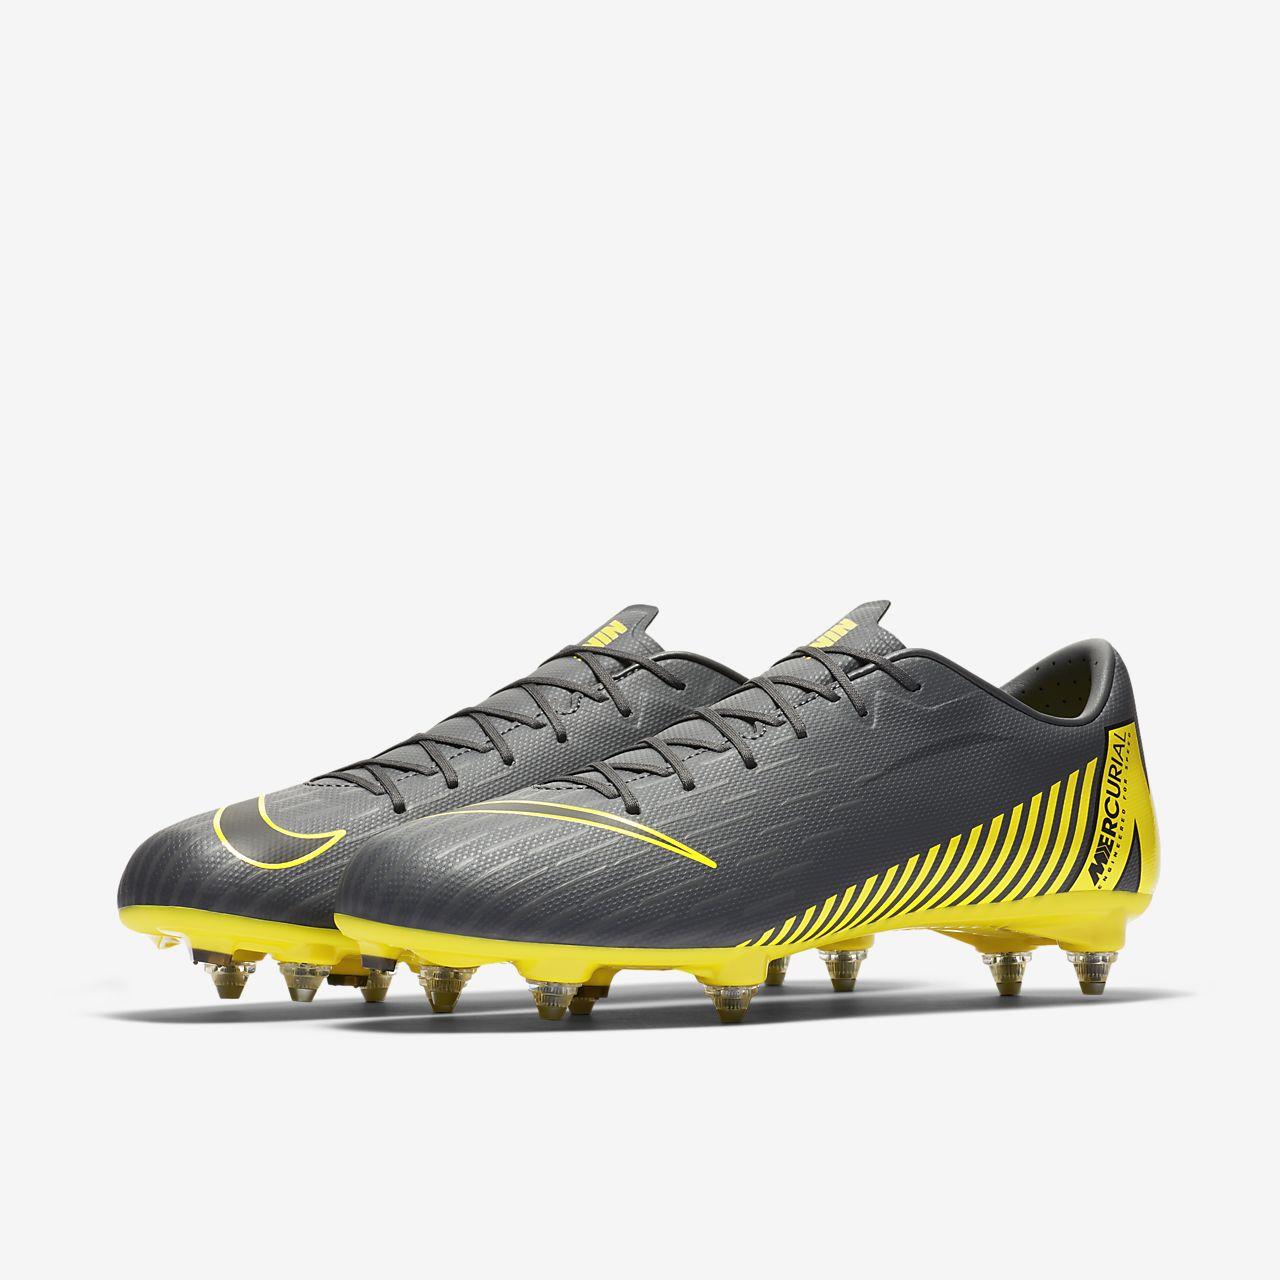 1e5ee14987f ... Chaussure de football à crampons pour terrain gras Nike Mercurial Vapor  XII Academy SG-PRO